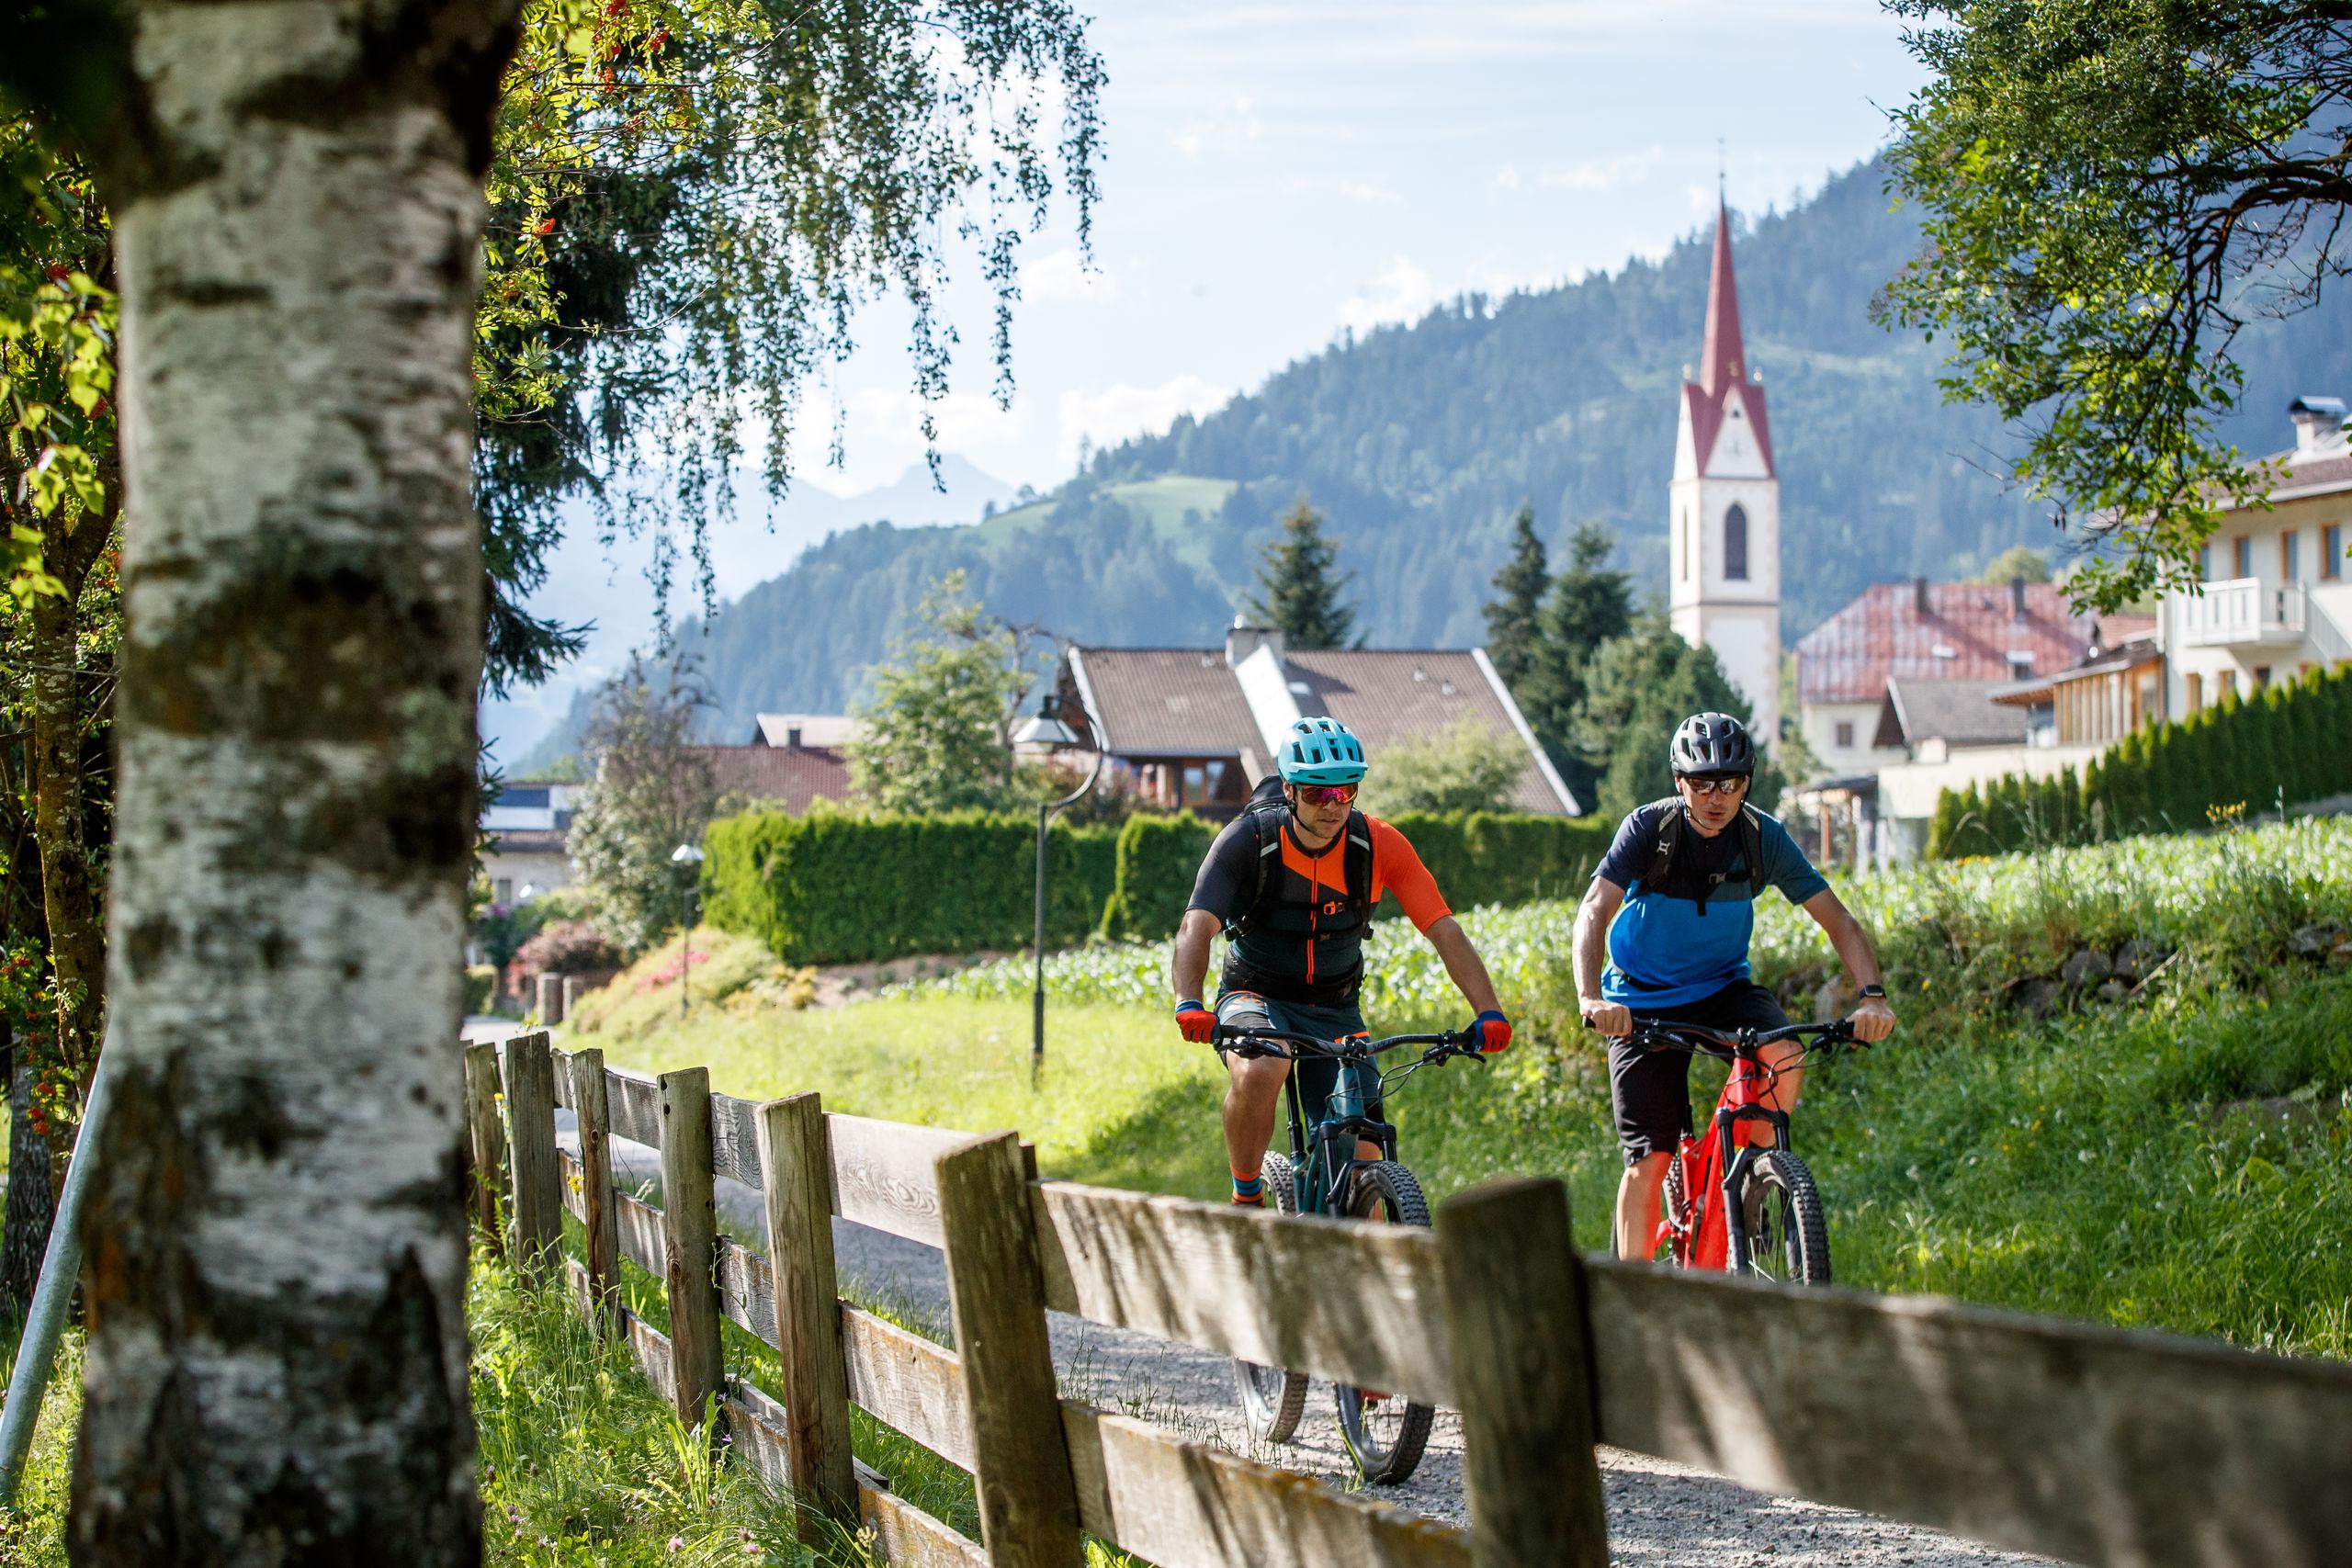 Esplora la soleggiata città di Lienz in Tirolo in bicicletta